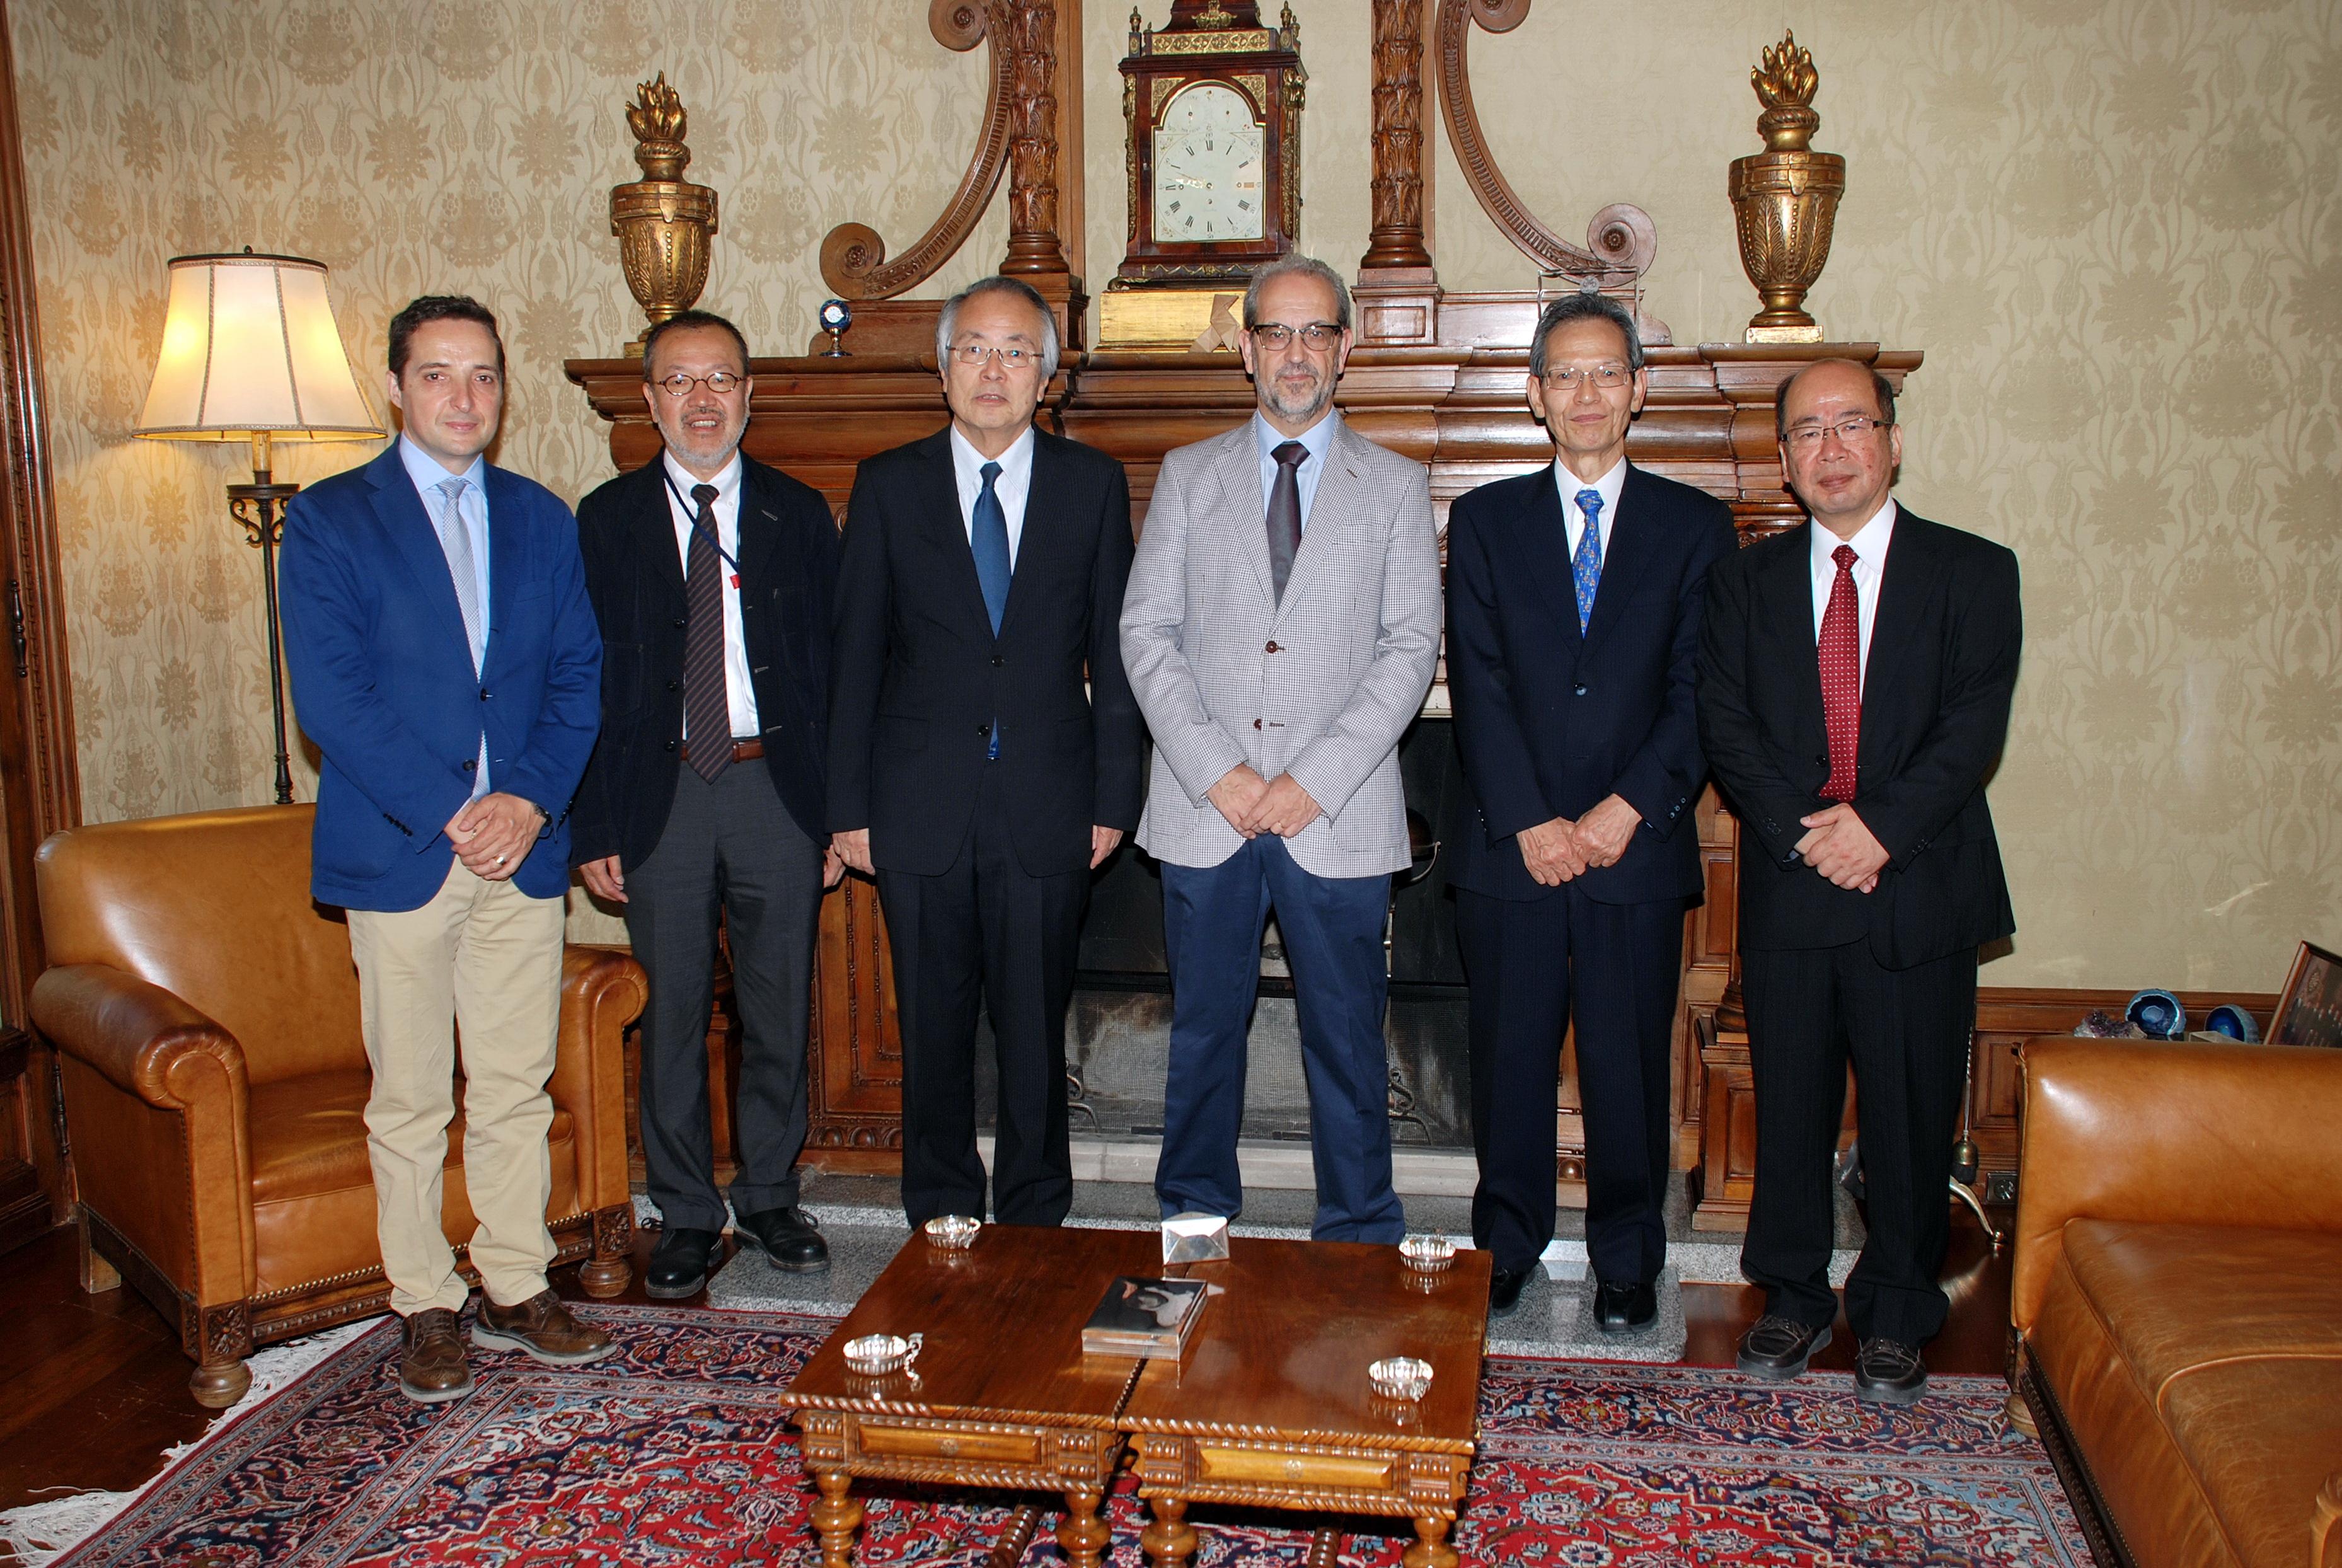 El rector de la Universidad de Salamanca, Daniel Hernández Ruipérez, recibe al rector del Osaka Institute of Technology